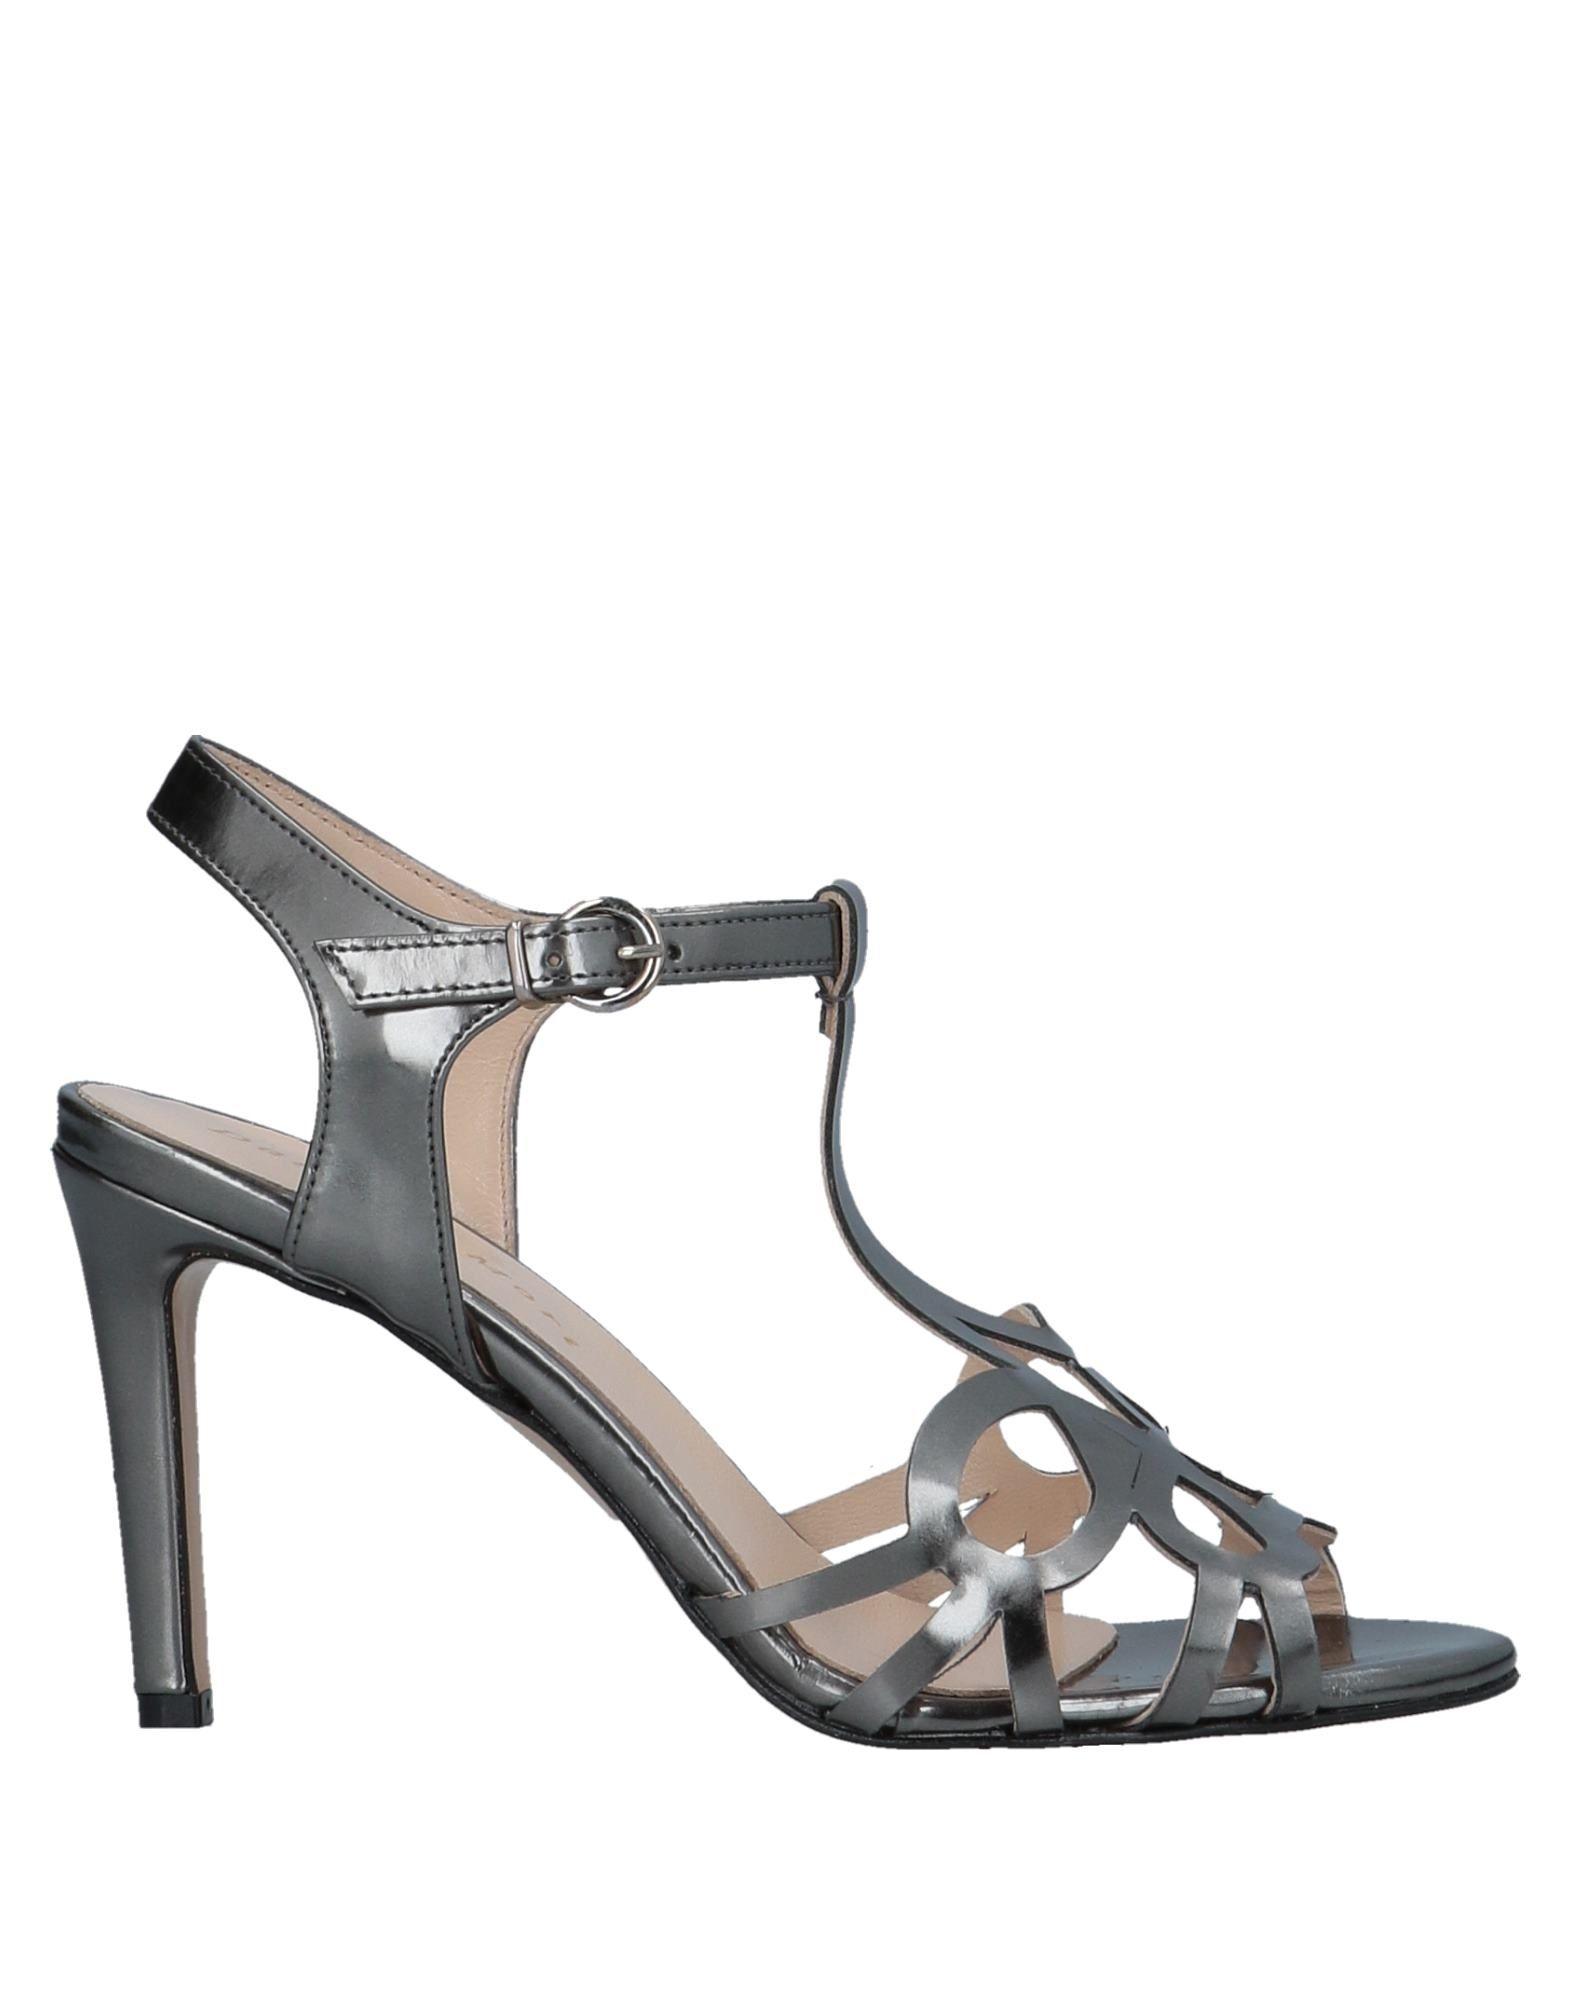 Daniela Mori Milano Sandalen Damen  11544761JX Gute Qualität beliebte Schuhe